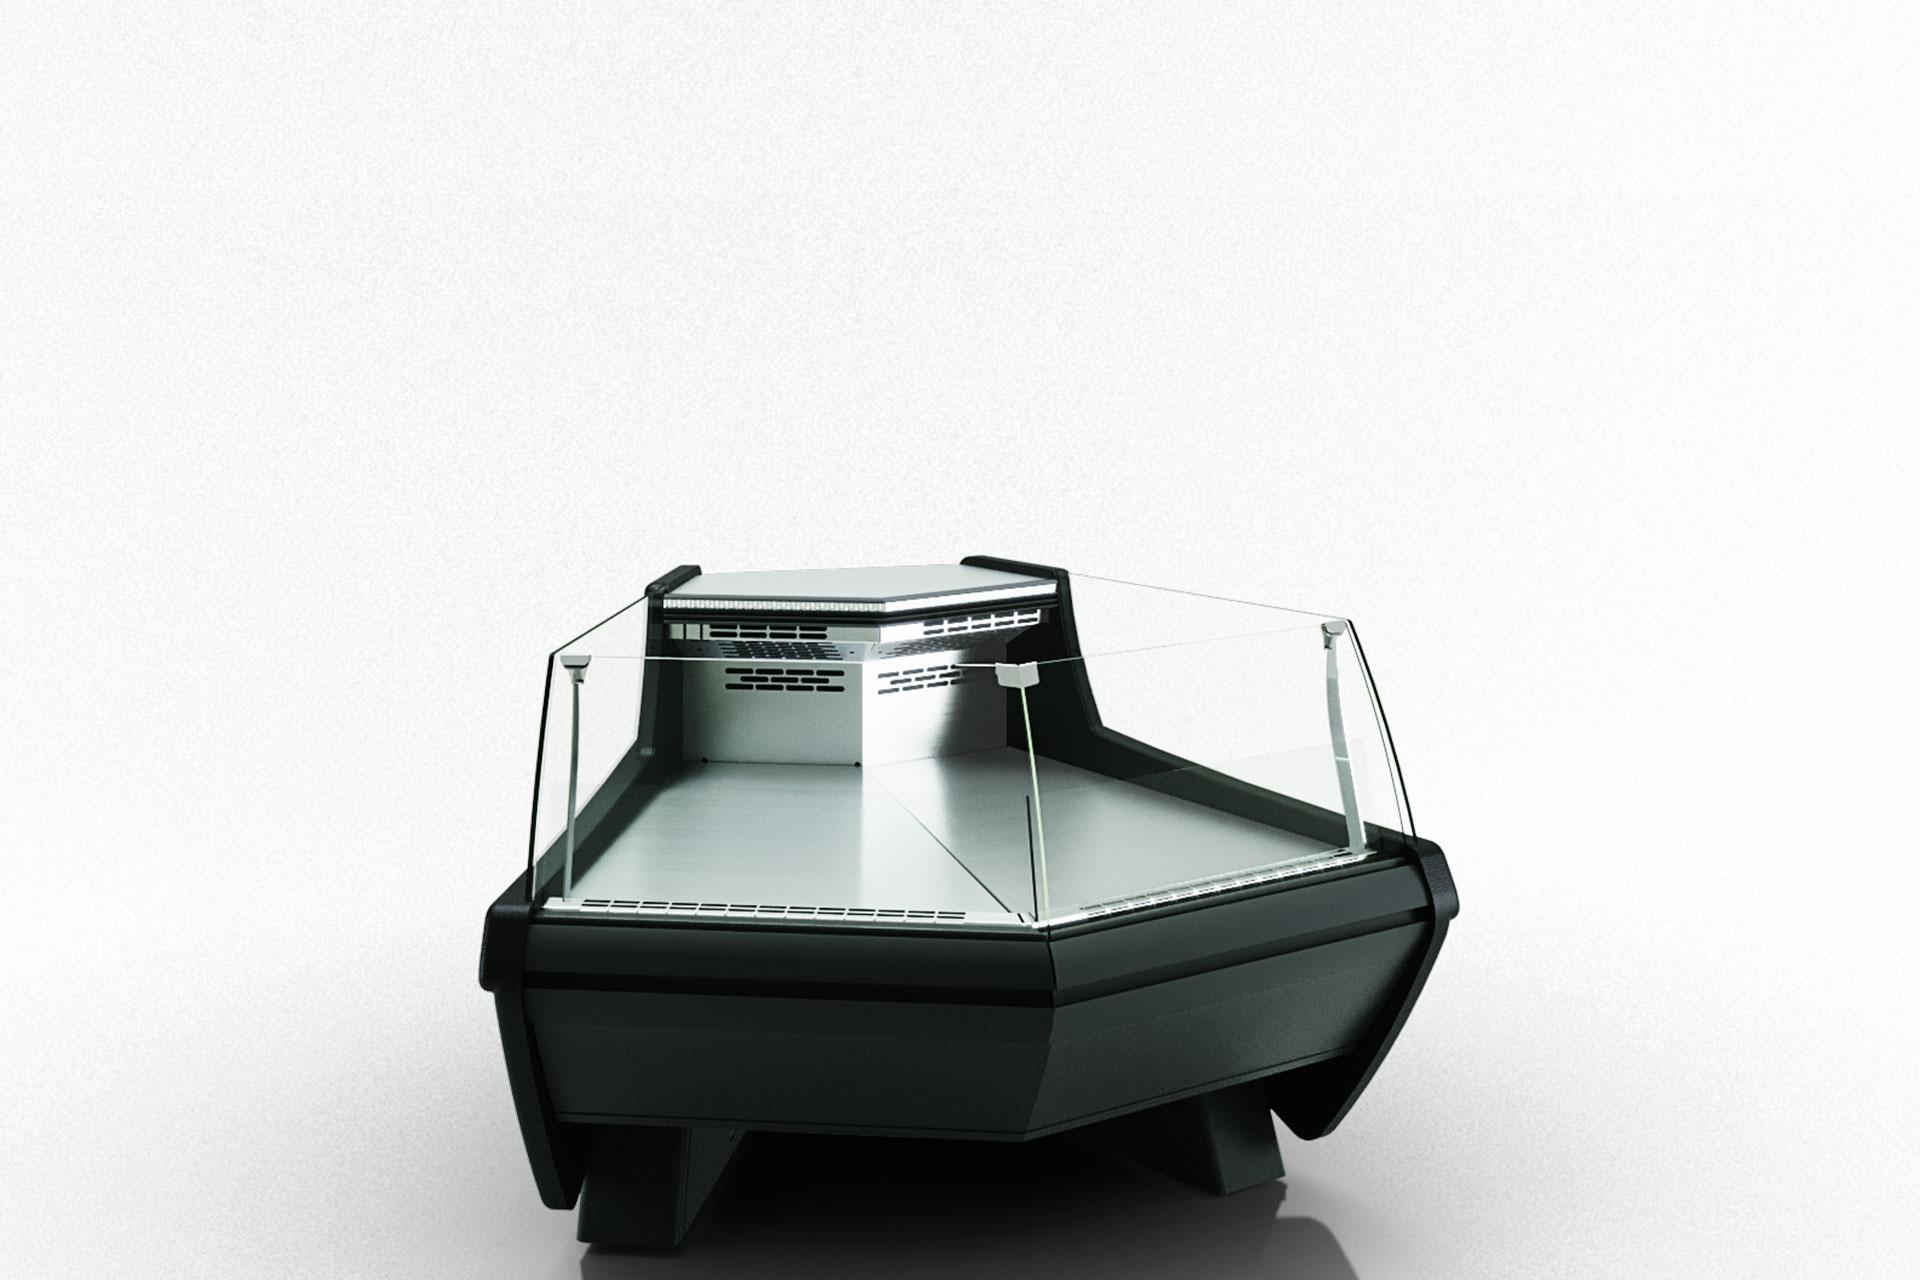 Вітрина Symphony luxe MG 100 deli self 085-DLM-ES45